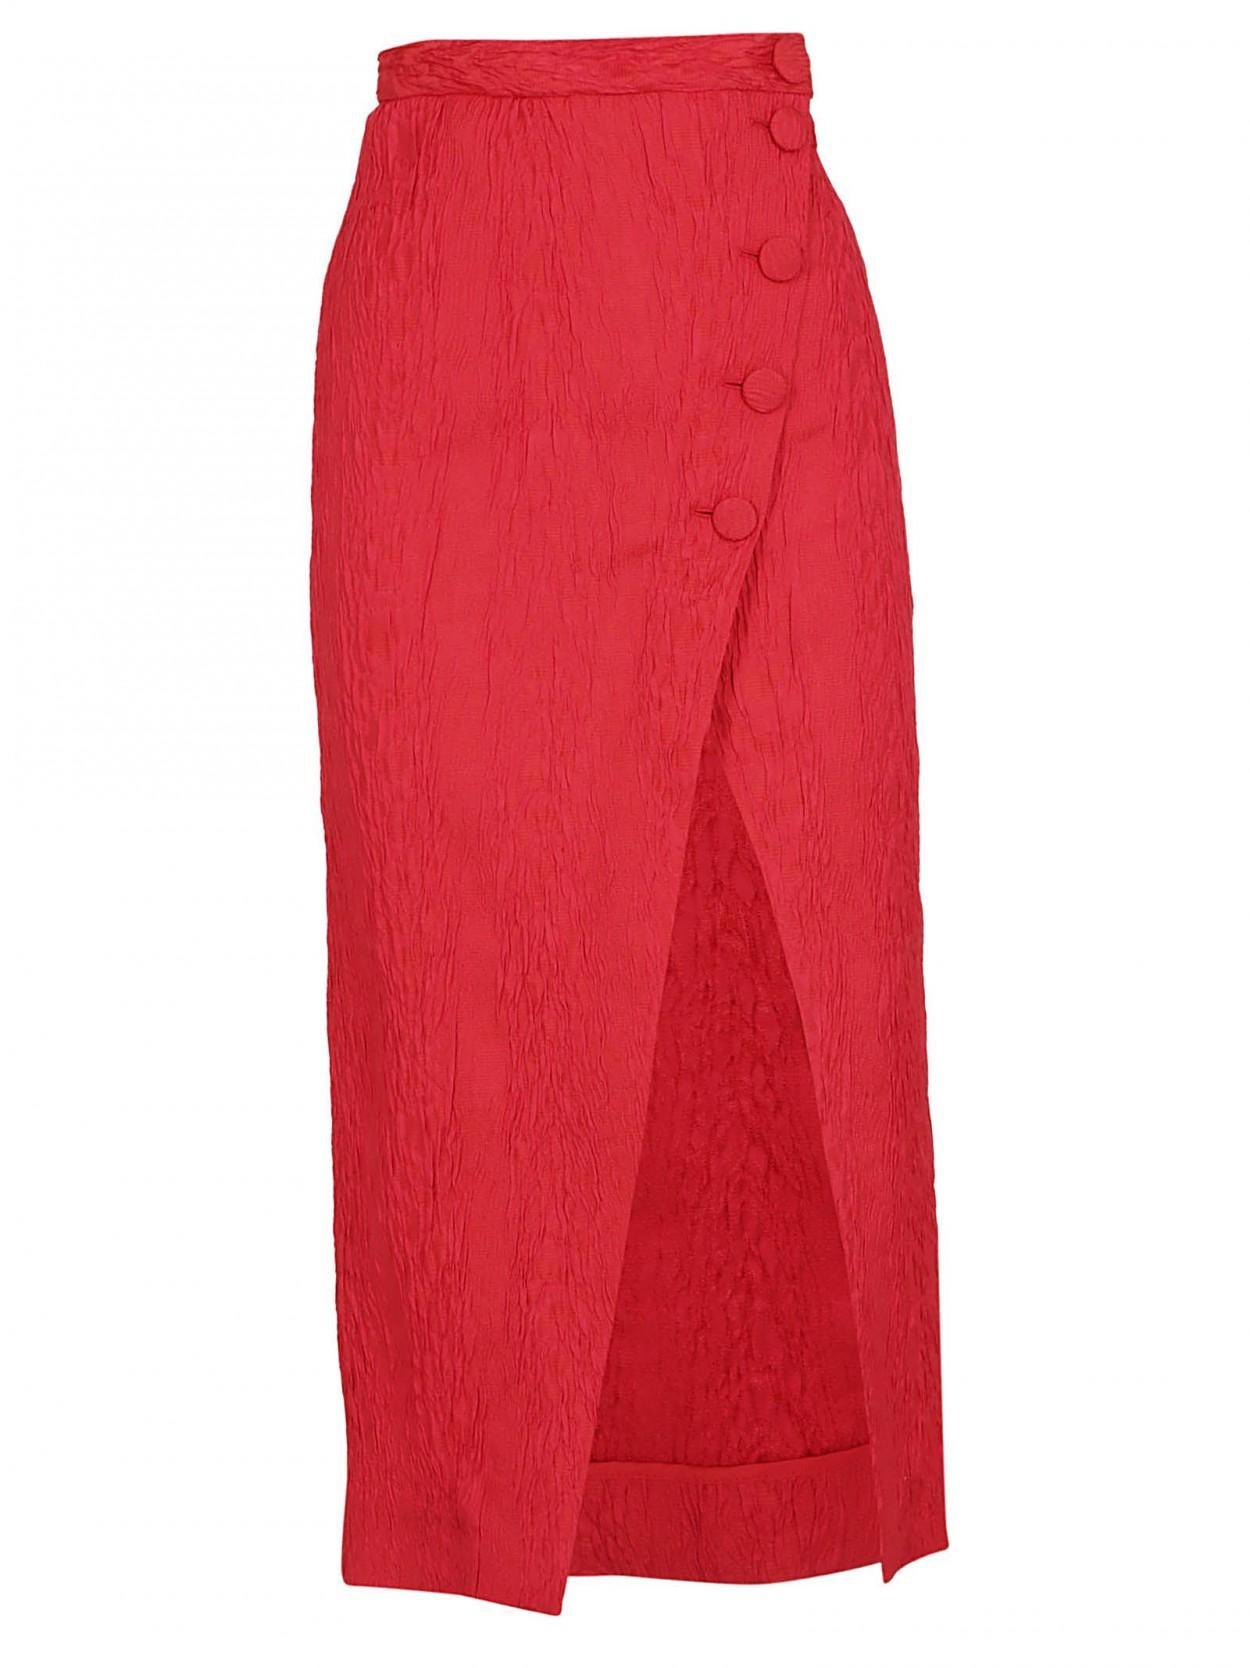 809a3ad10b Lyst - ALEXACHUNG ALEXA CHUNG gonna pencil rossa in Red